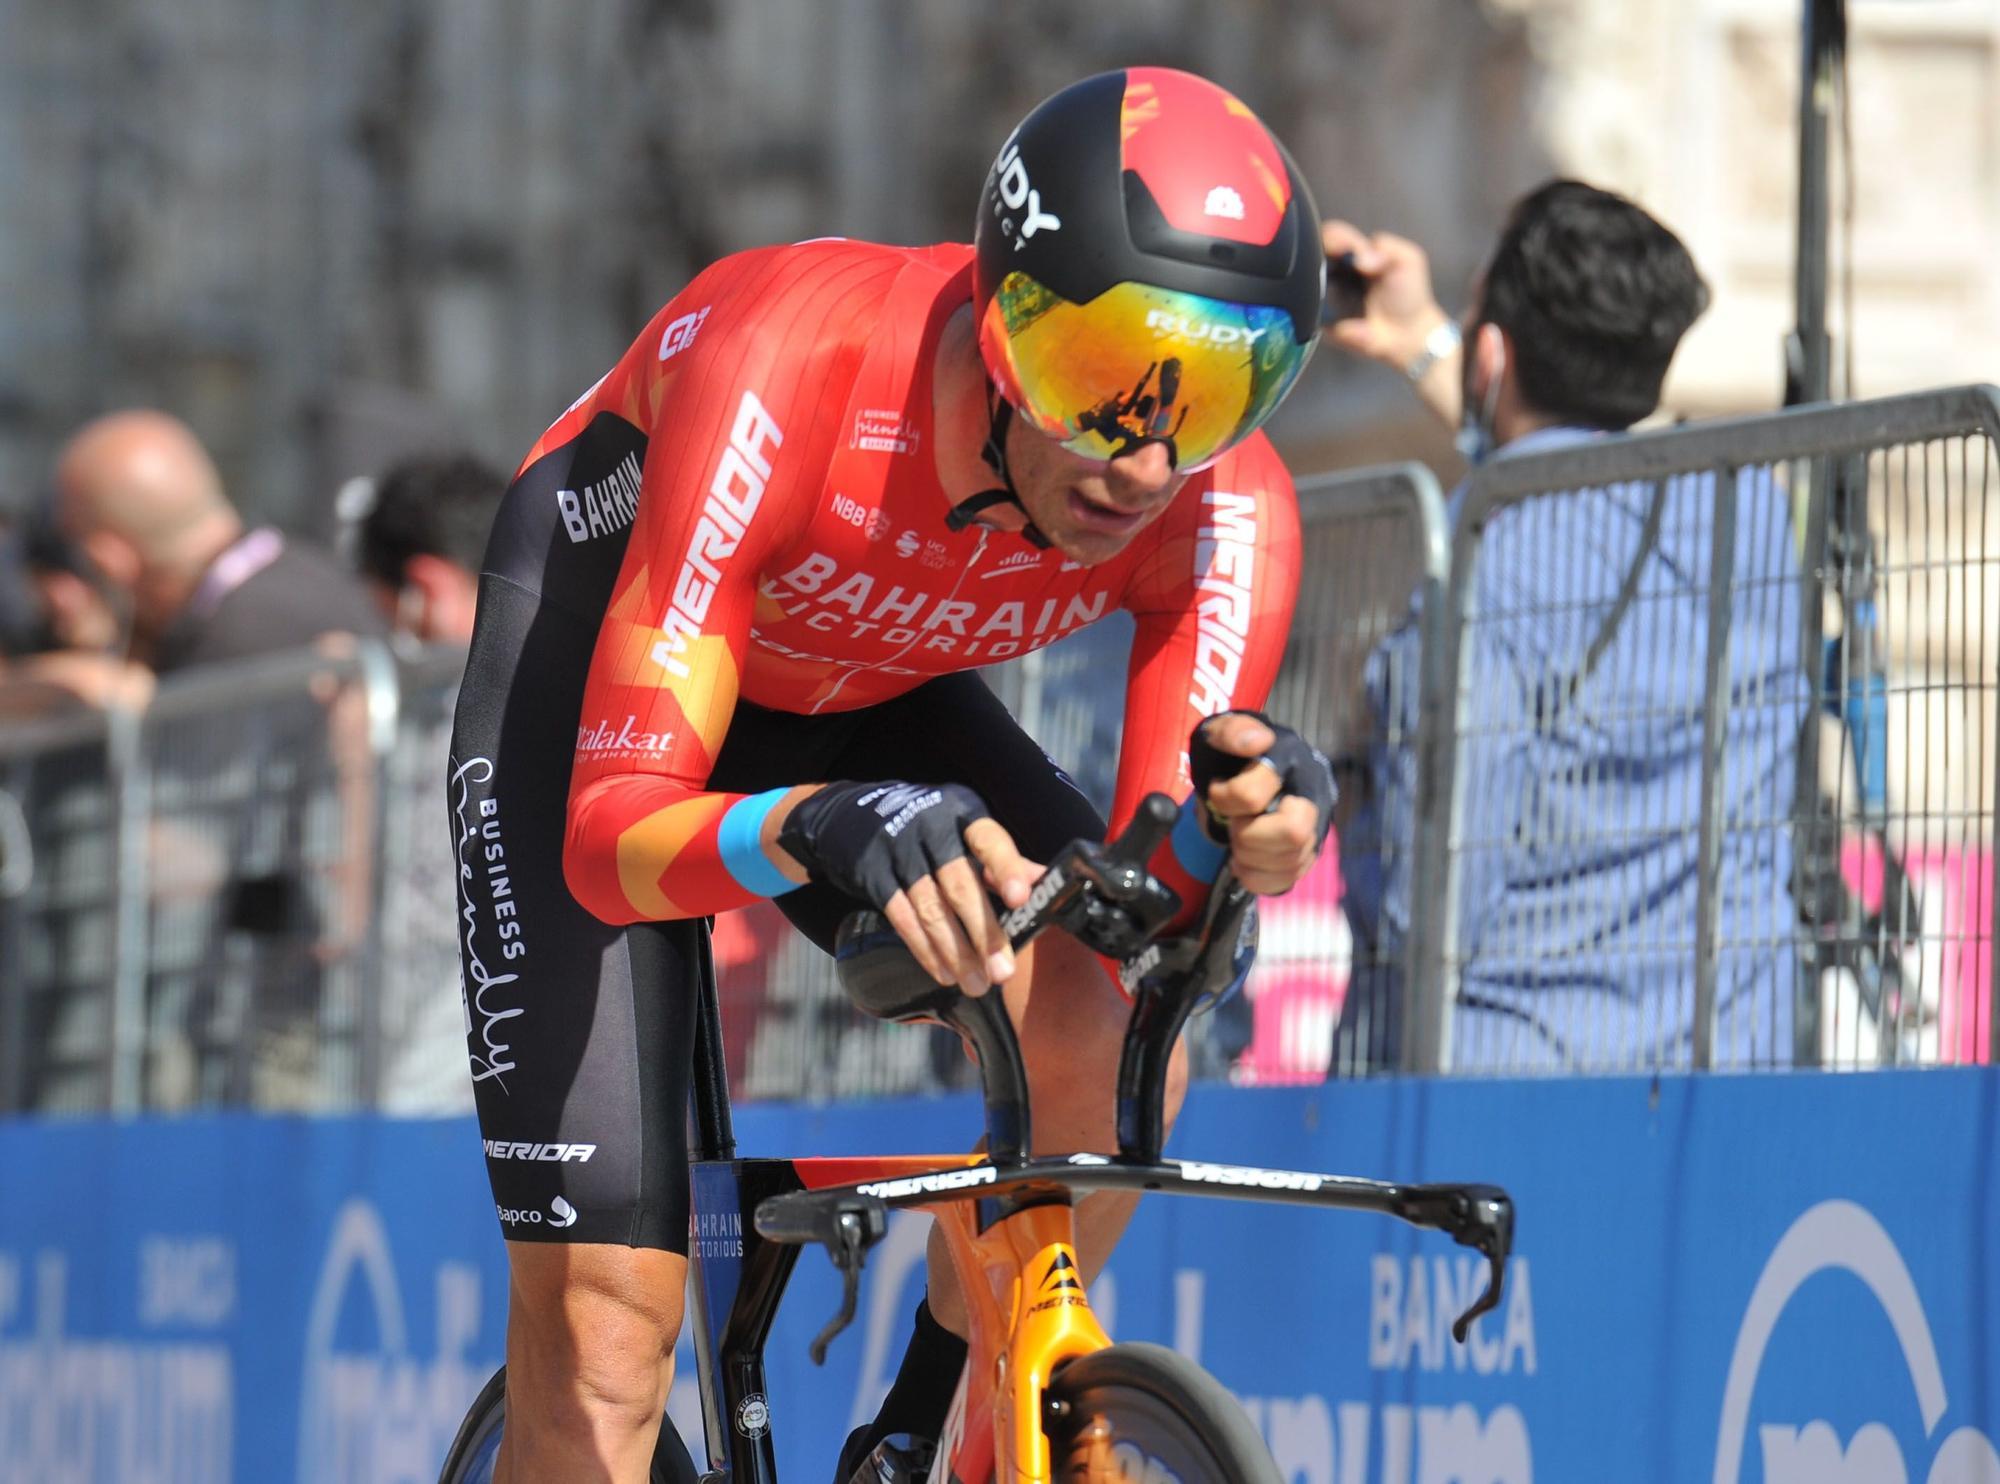 Giro d' Italia (113051834).jpg